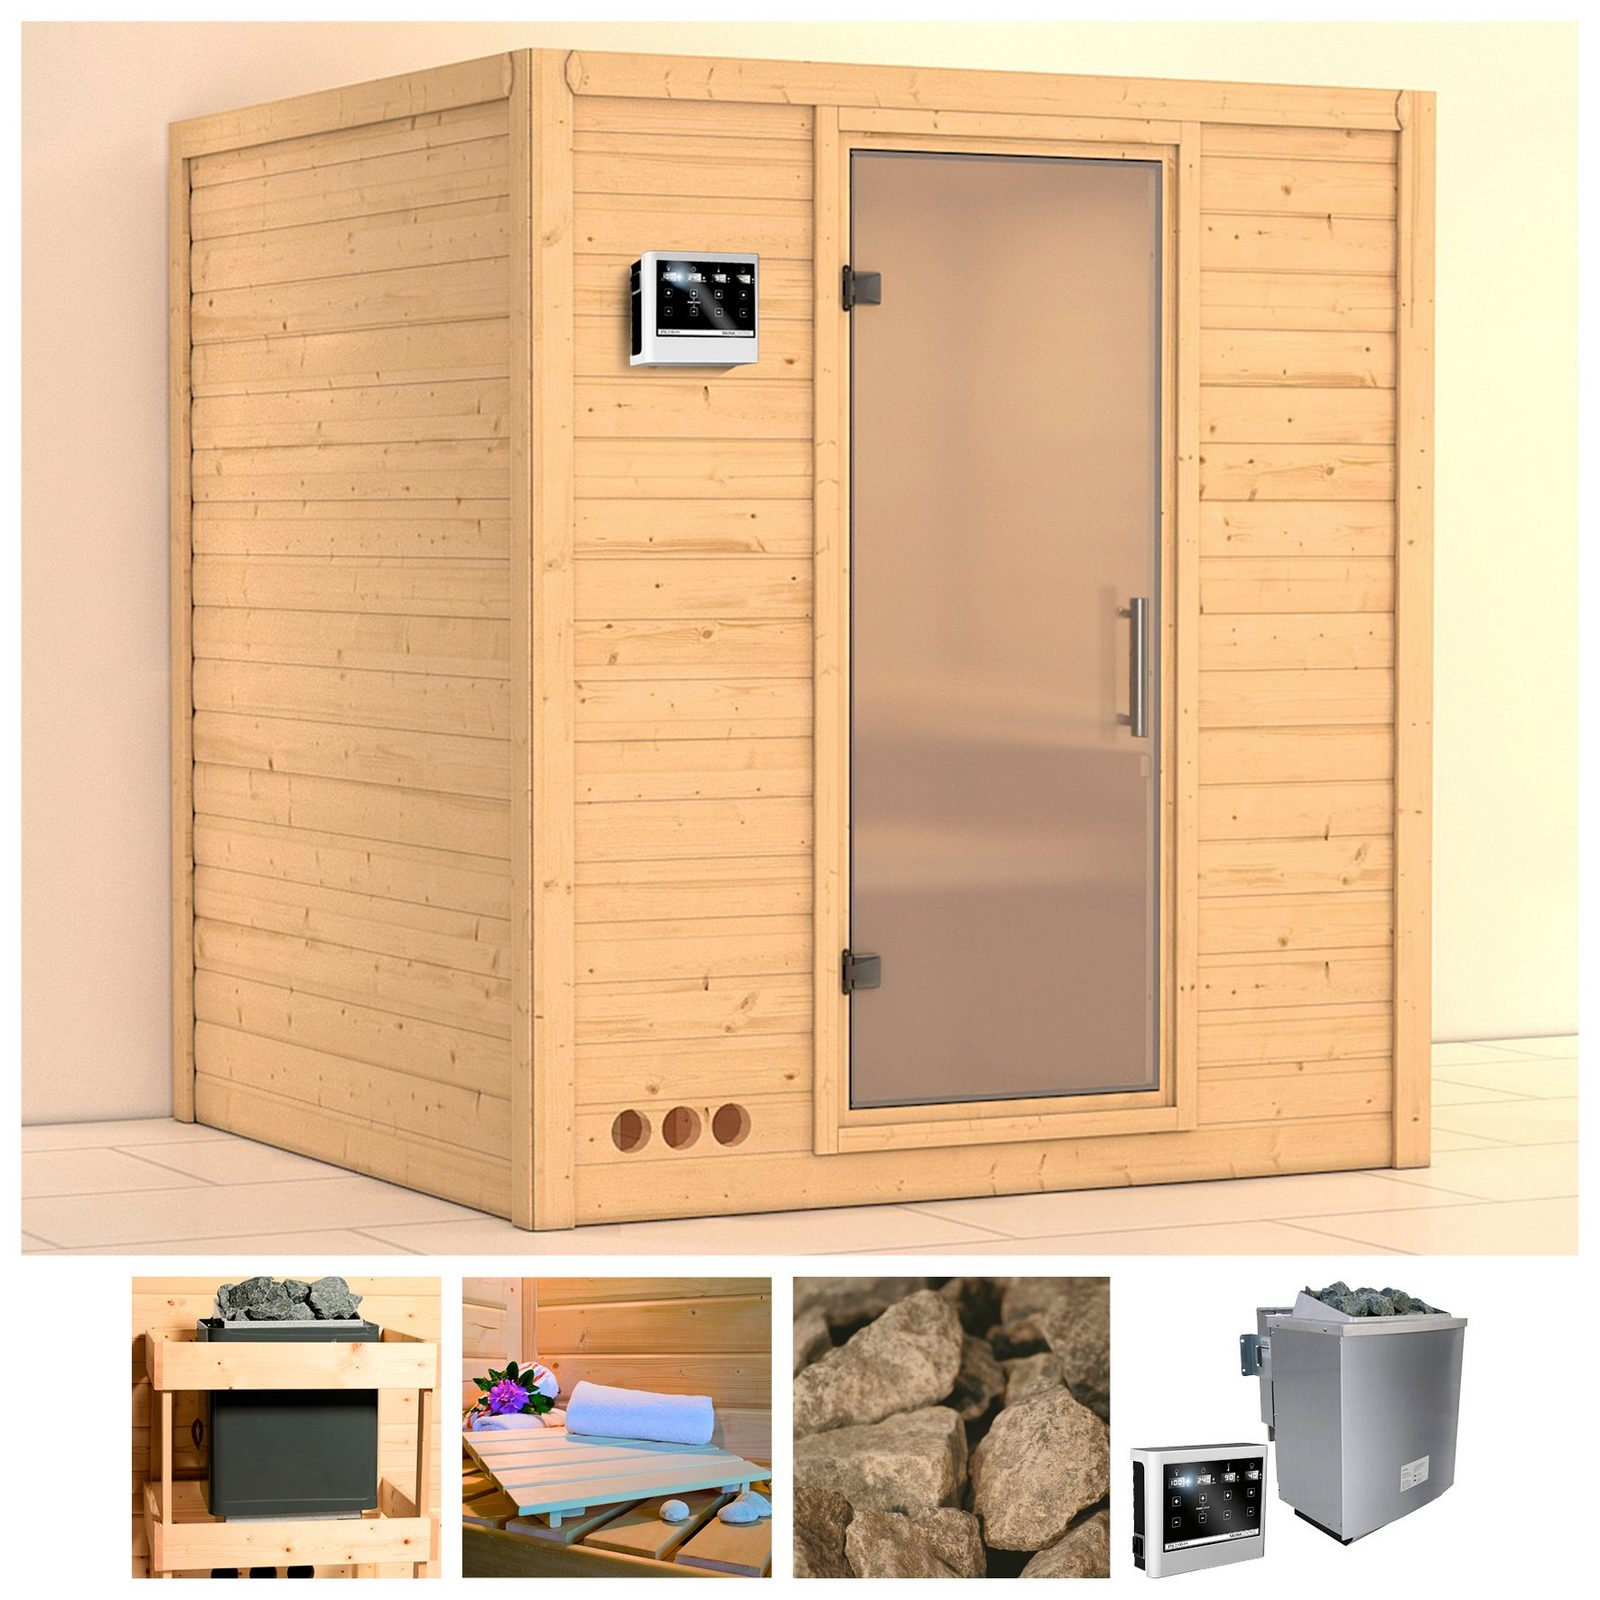 KARIBU Sauna »Mojave«, 193/184/209 cm, 9-kW-Bio-Ofen, ext. Strg., Glastür satiniert